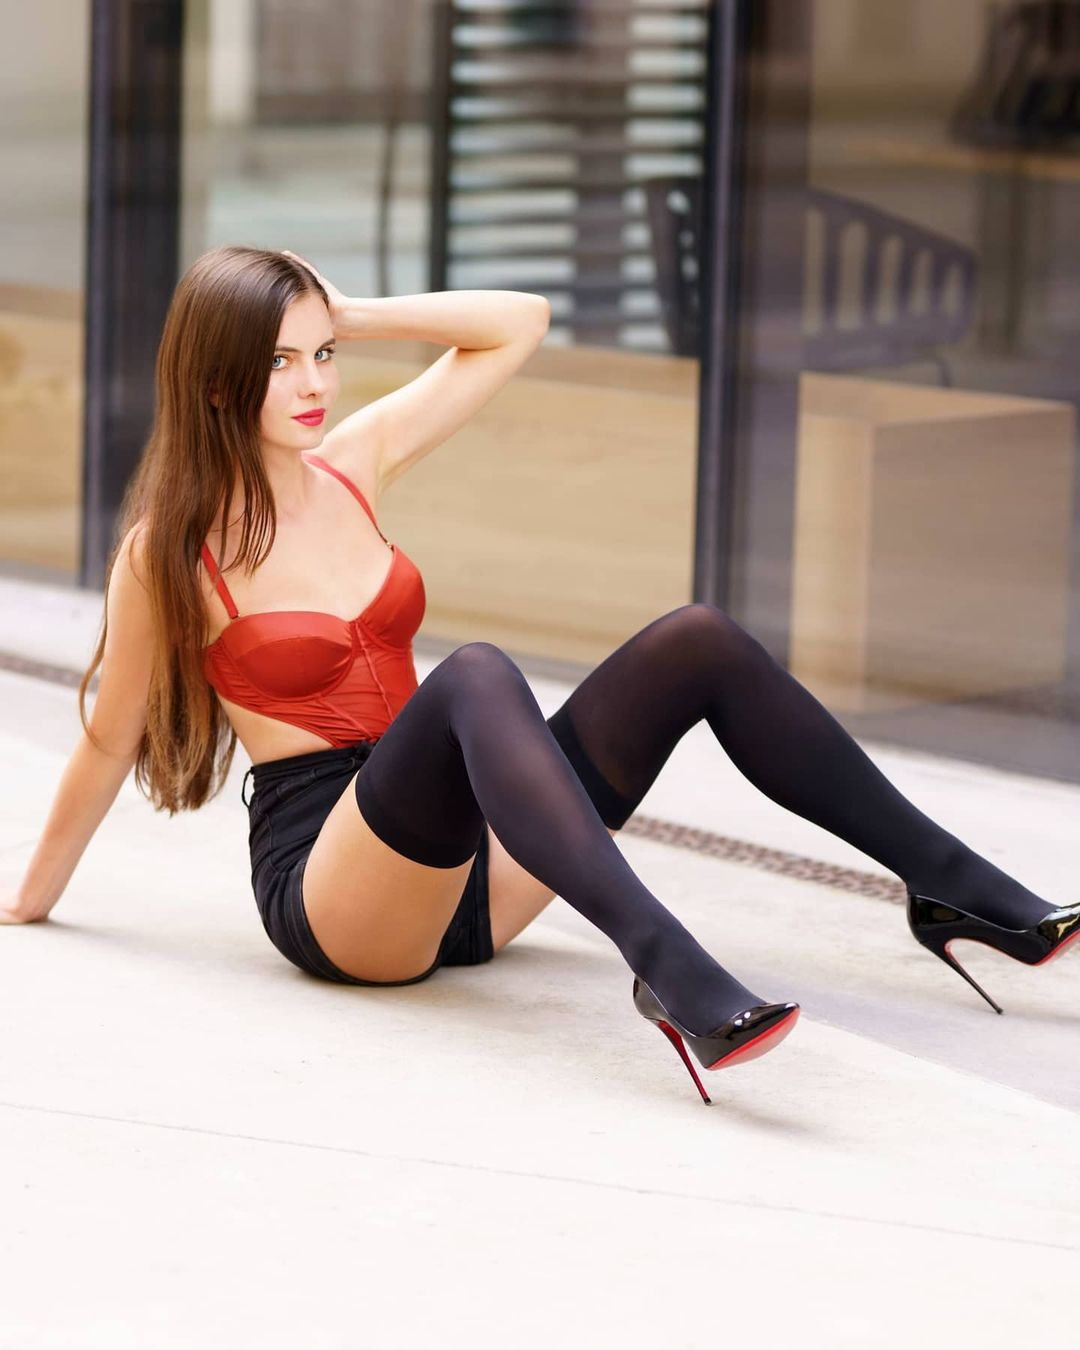 Ariadna - девушка дня из инстаграм (27 Фото) 23